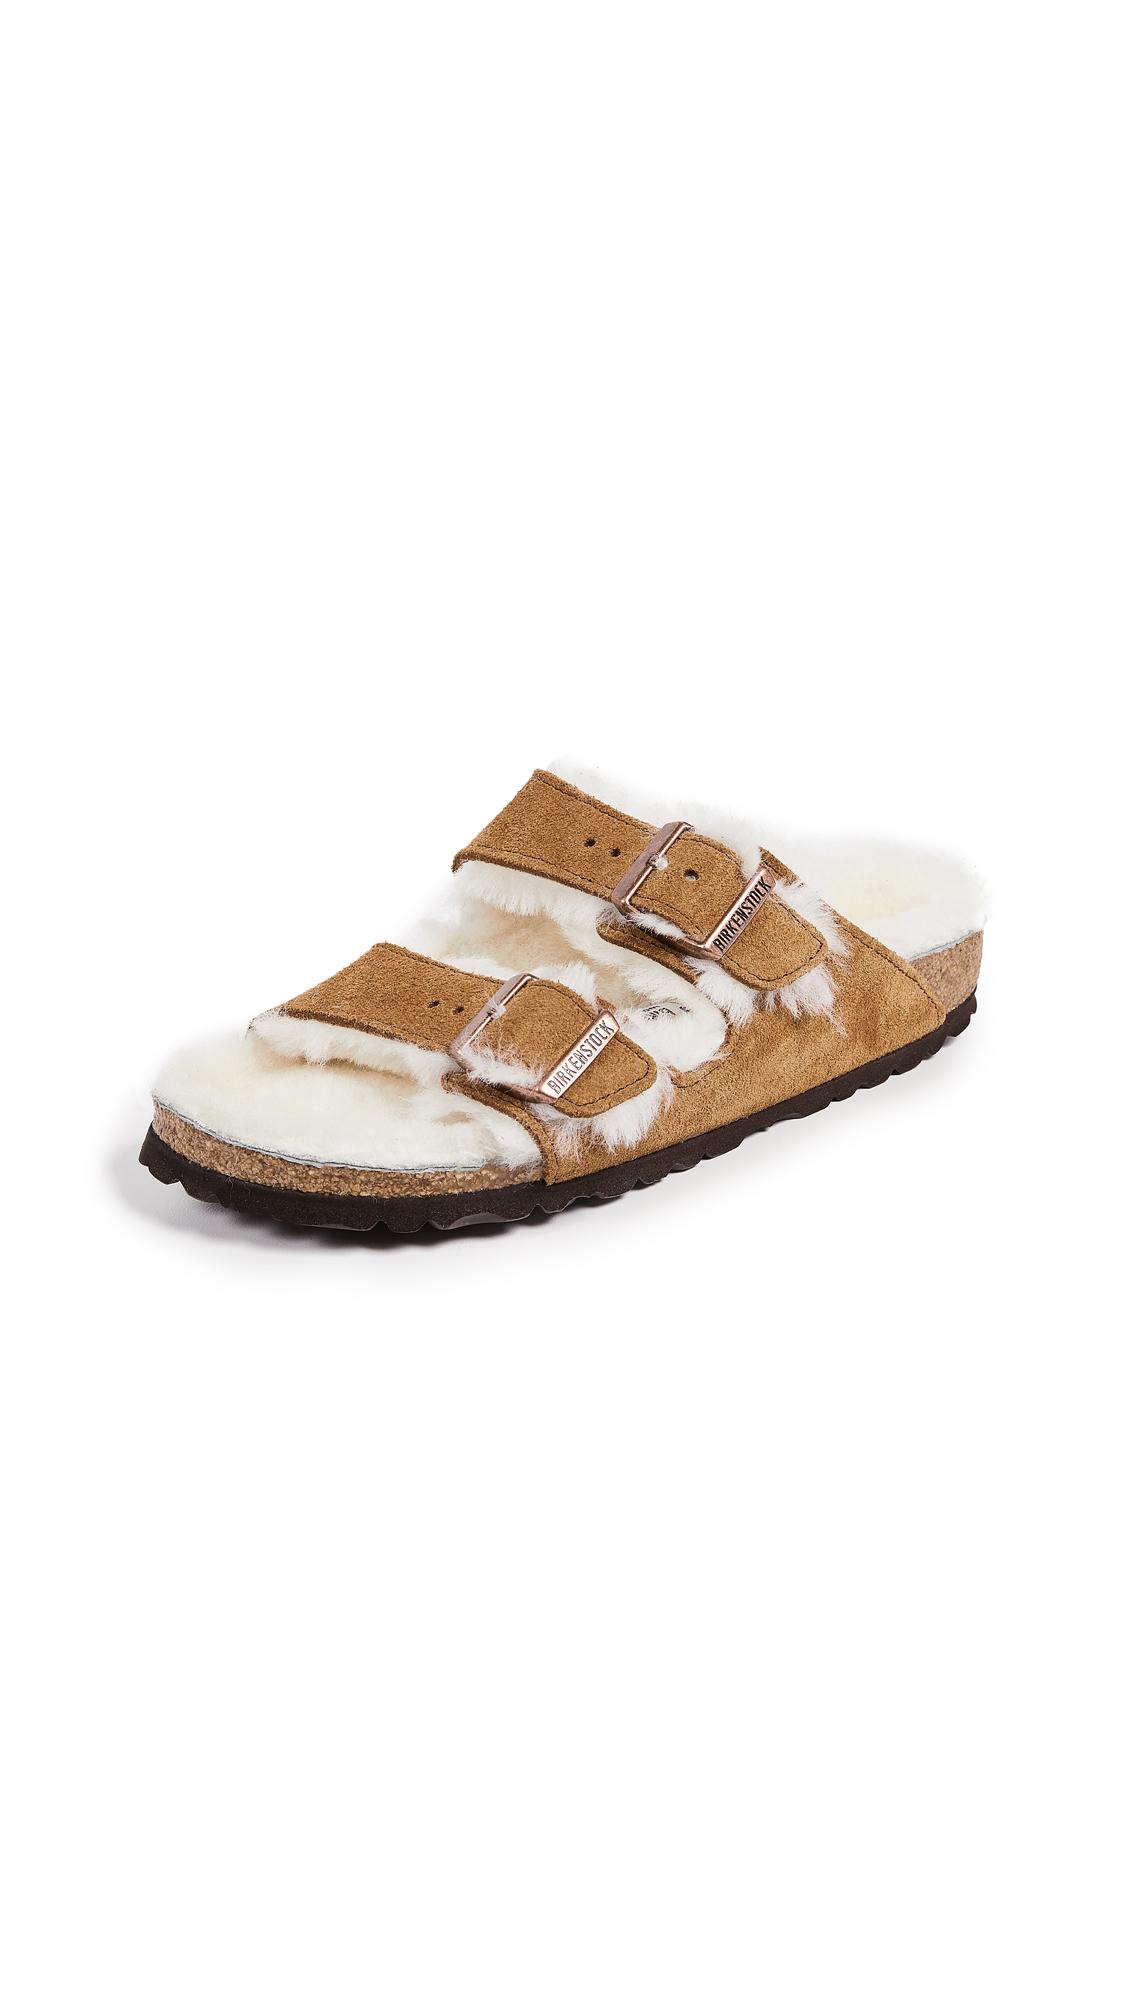 Birkenstock Arizona Shearling Sandals - Mink